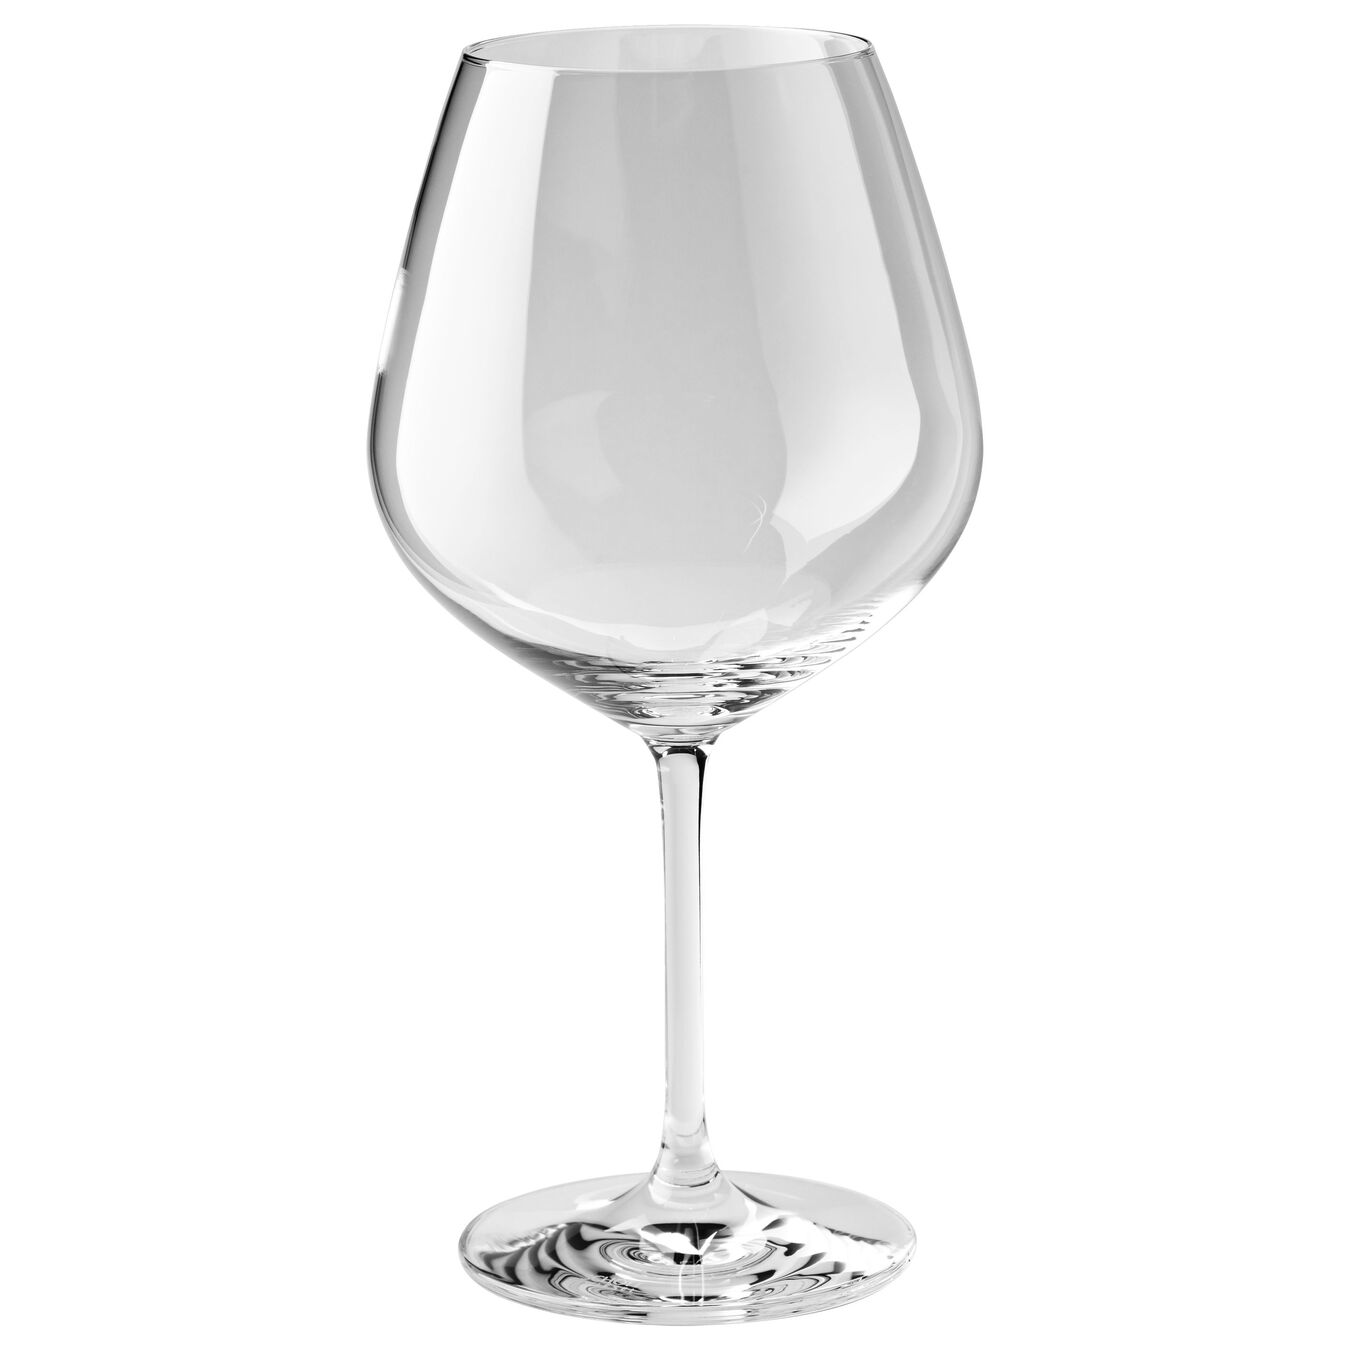 Rotweinglas 725 ml,,large 1